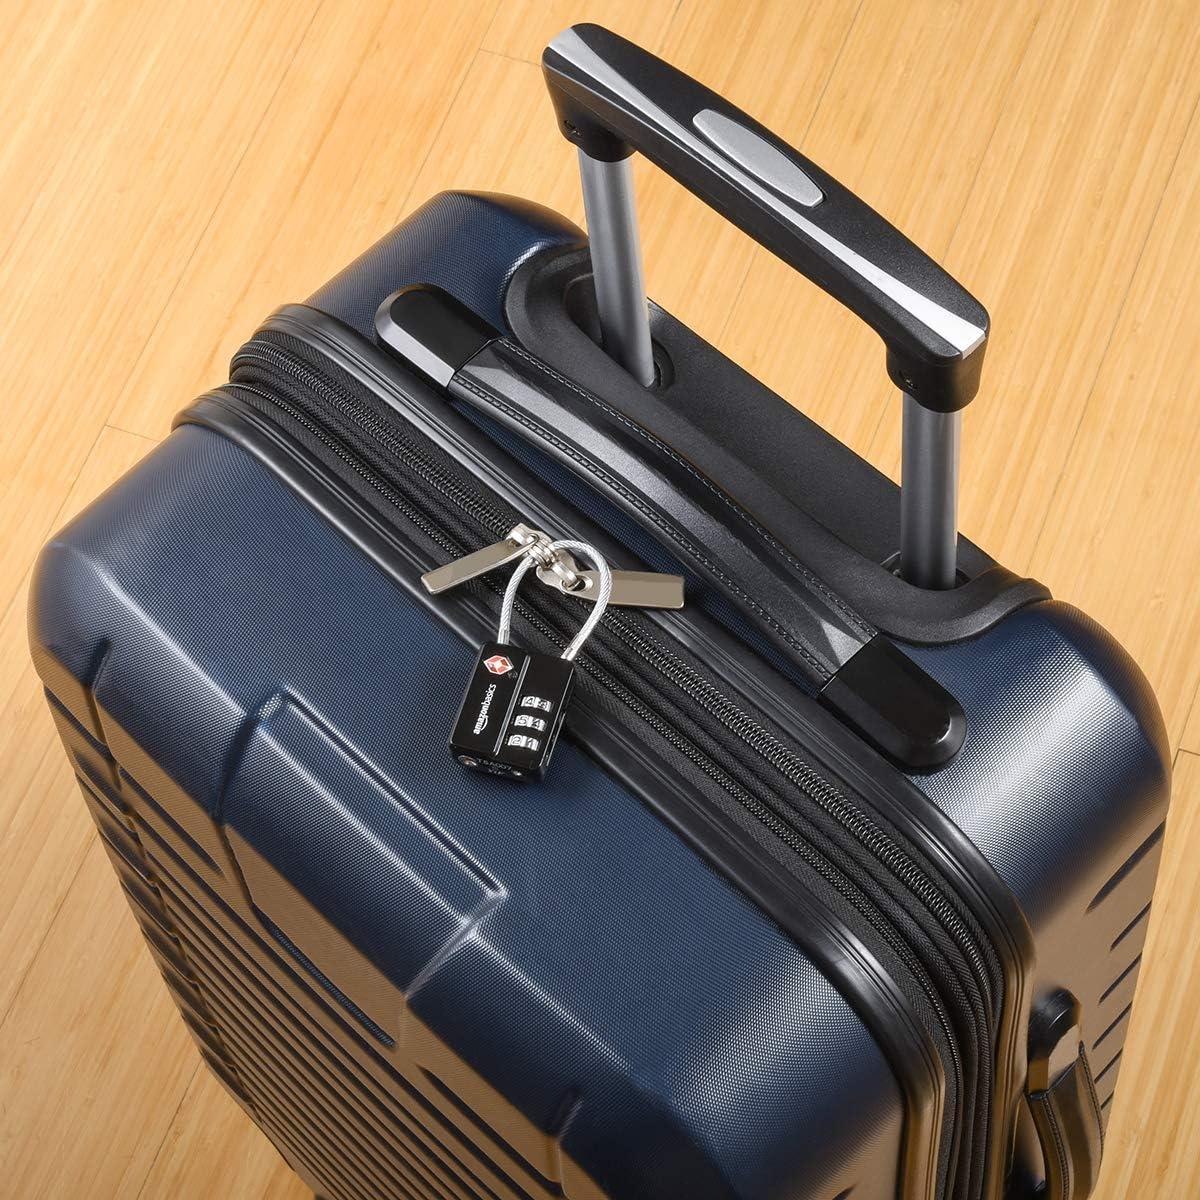 Basics TSA Accepted Cable 3-Digit Combination Lock Black 2-Pack